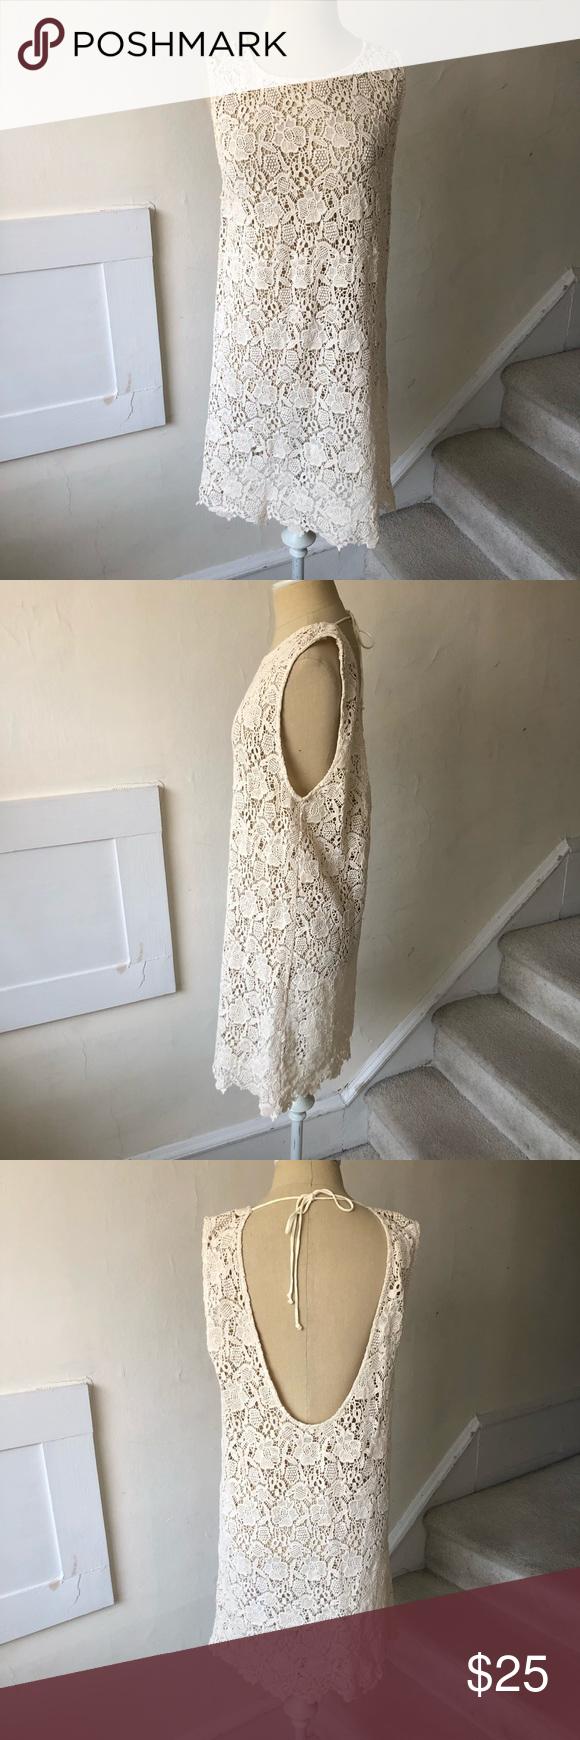 fbdc24acc911b Olivaceous Crochet Low Back Dress/Cover Up Cute crochet dress from  Olivaceous. Semi sheer